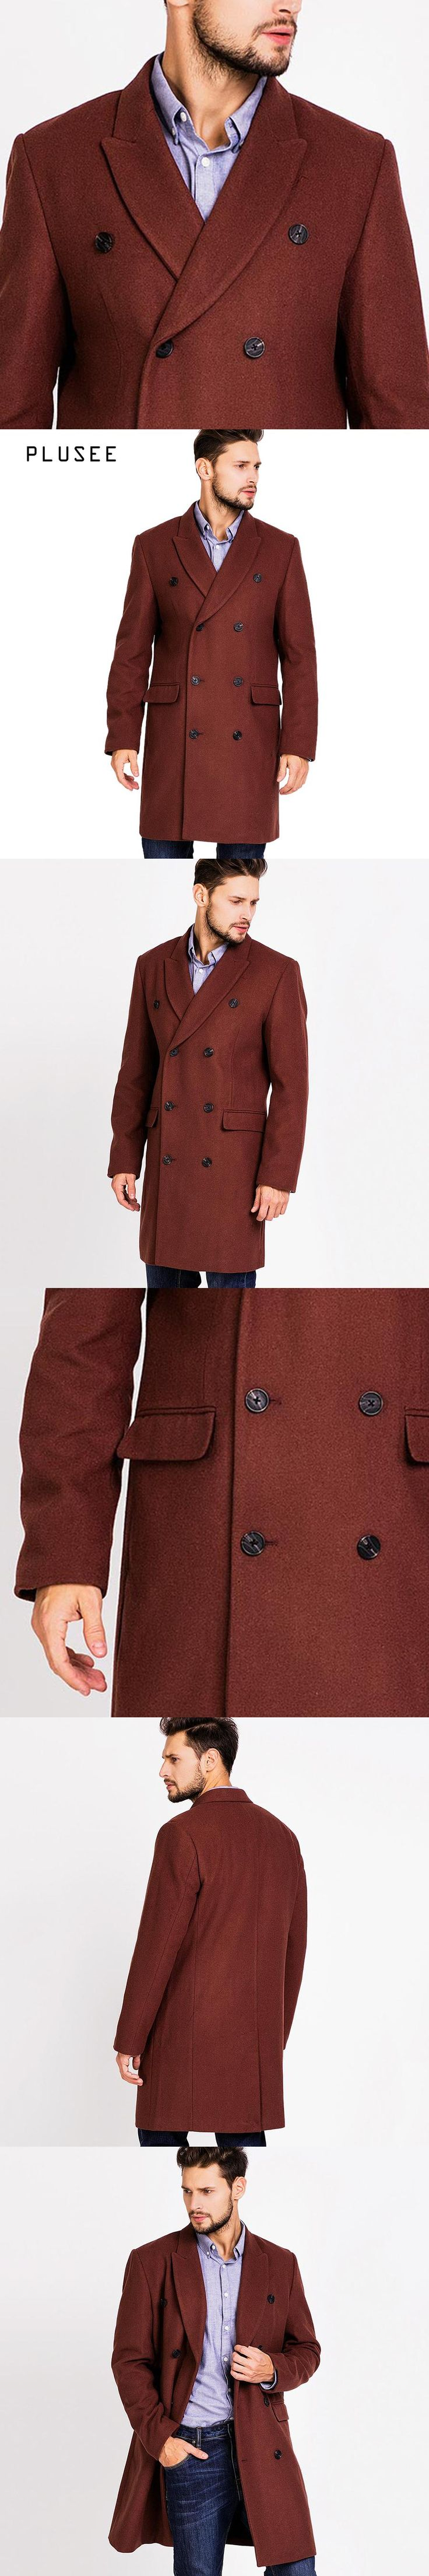 Plusee long wool coat men double breasted wool coat male 2017 spring turn down collar wine red long wool coat men overcoat M-XXL